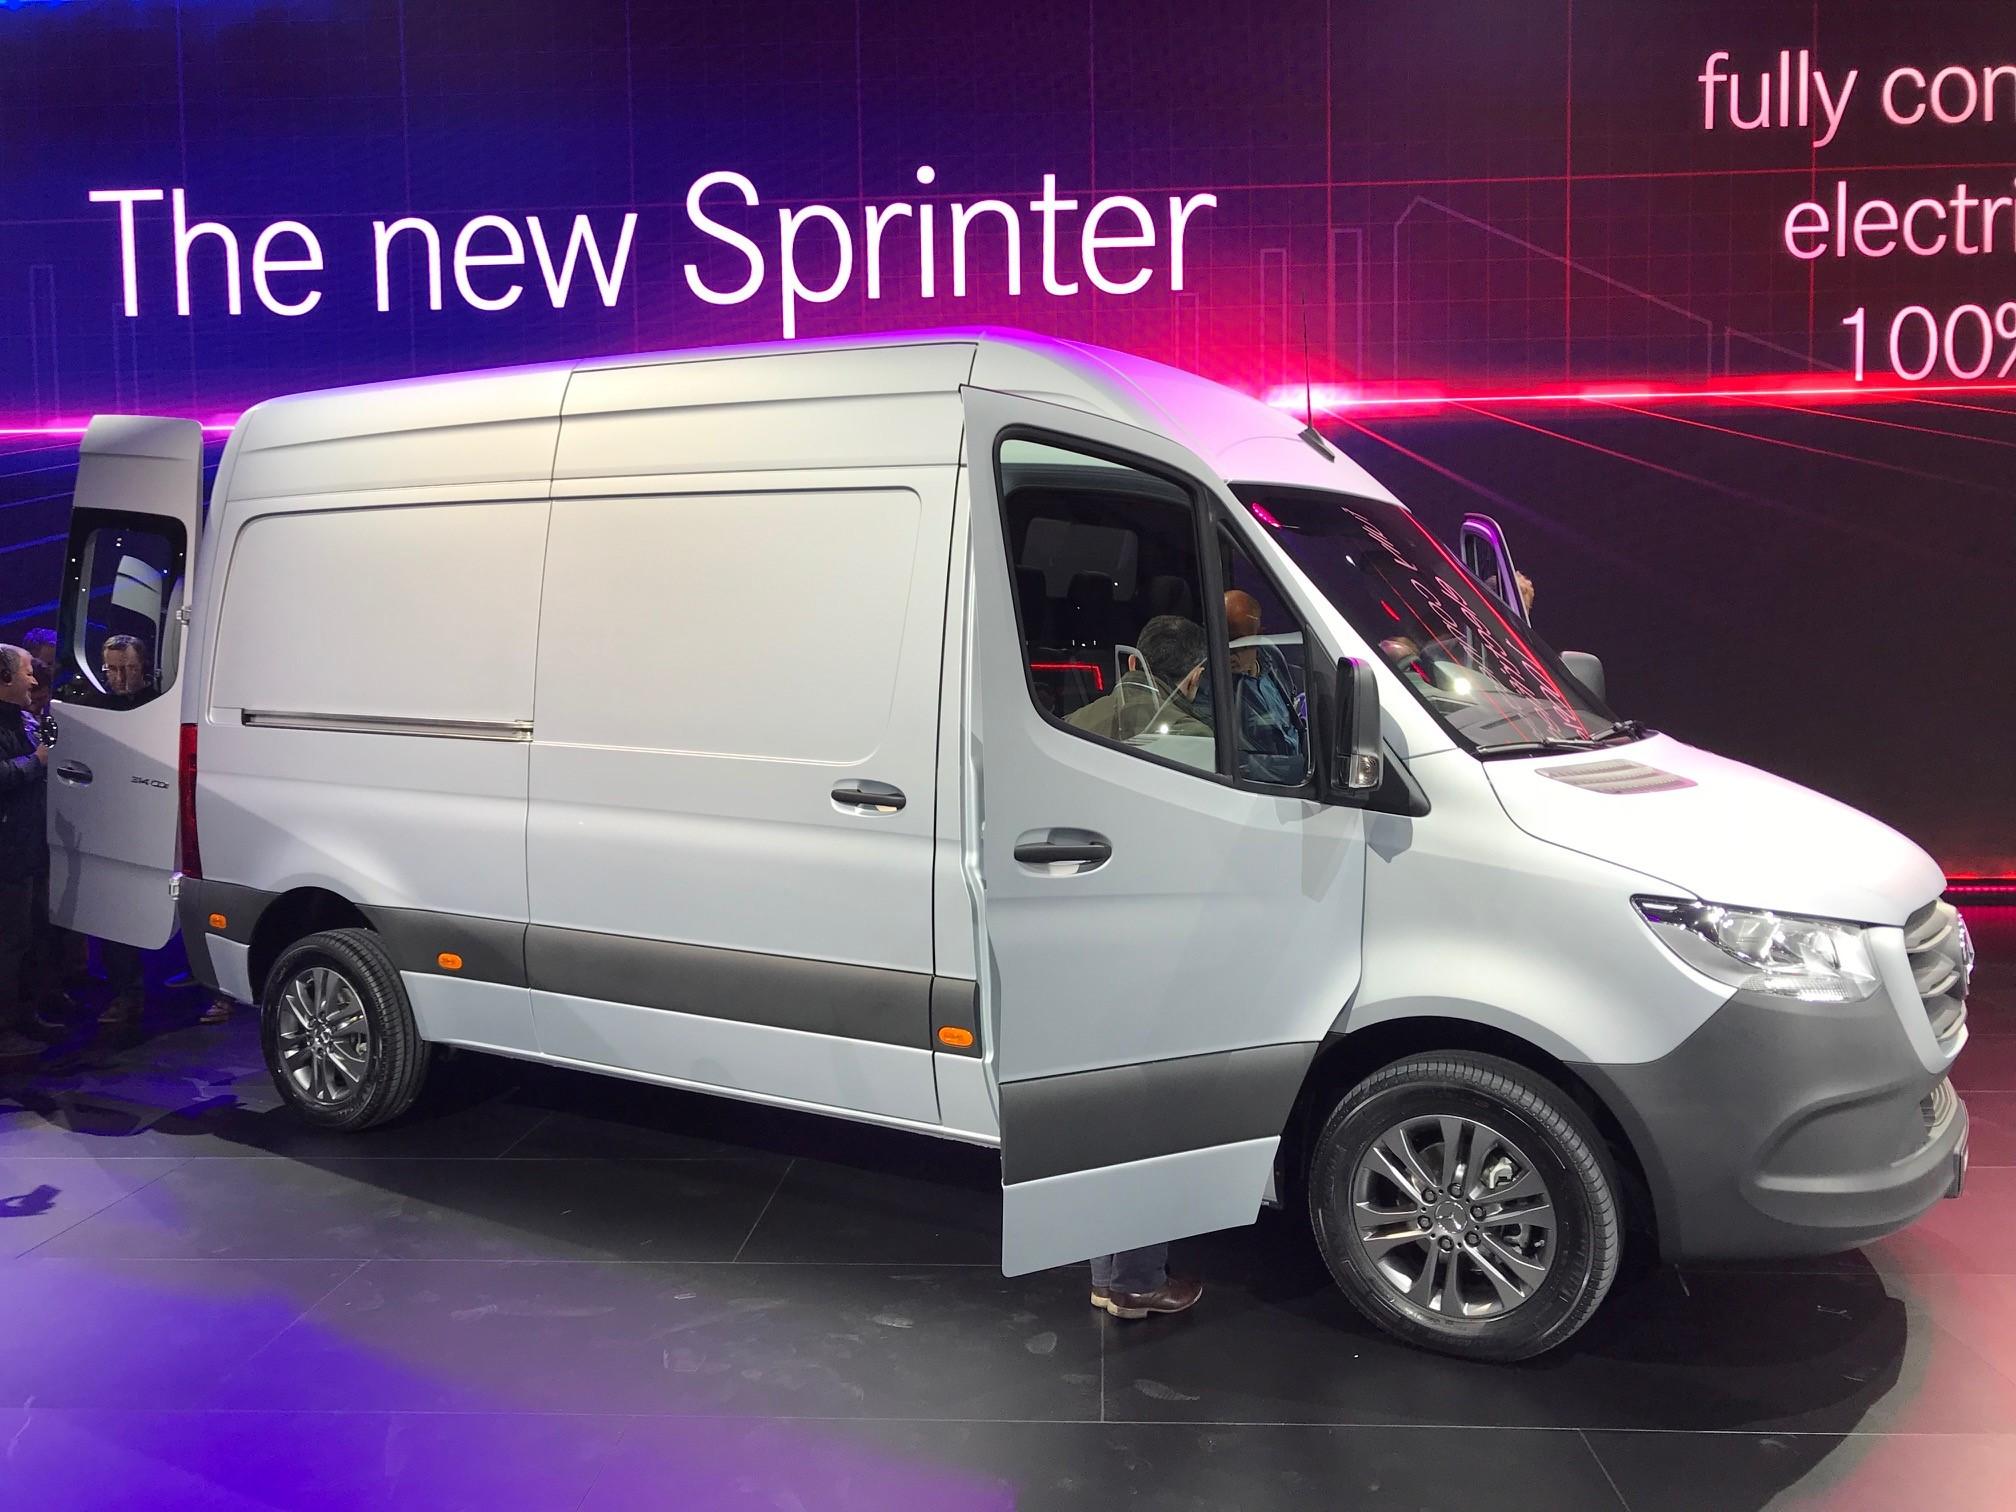 3f5cbddc1d Mercedes-Benz reveals new Sprinter - Truck News